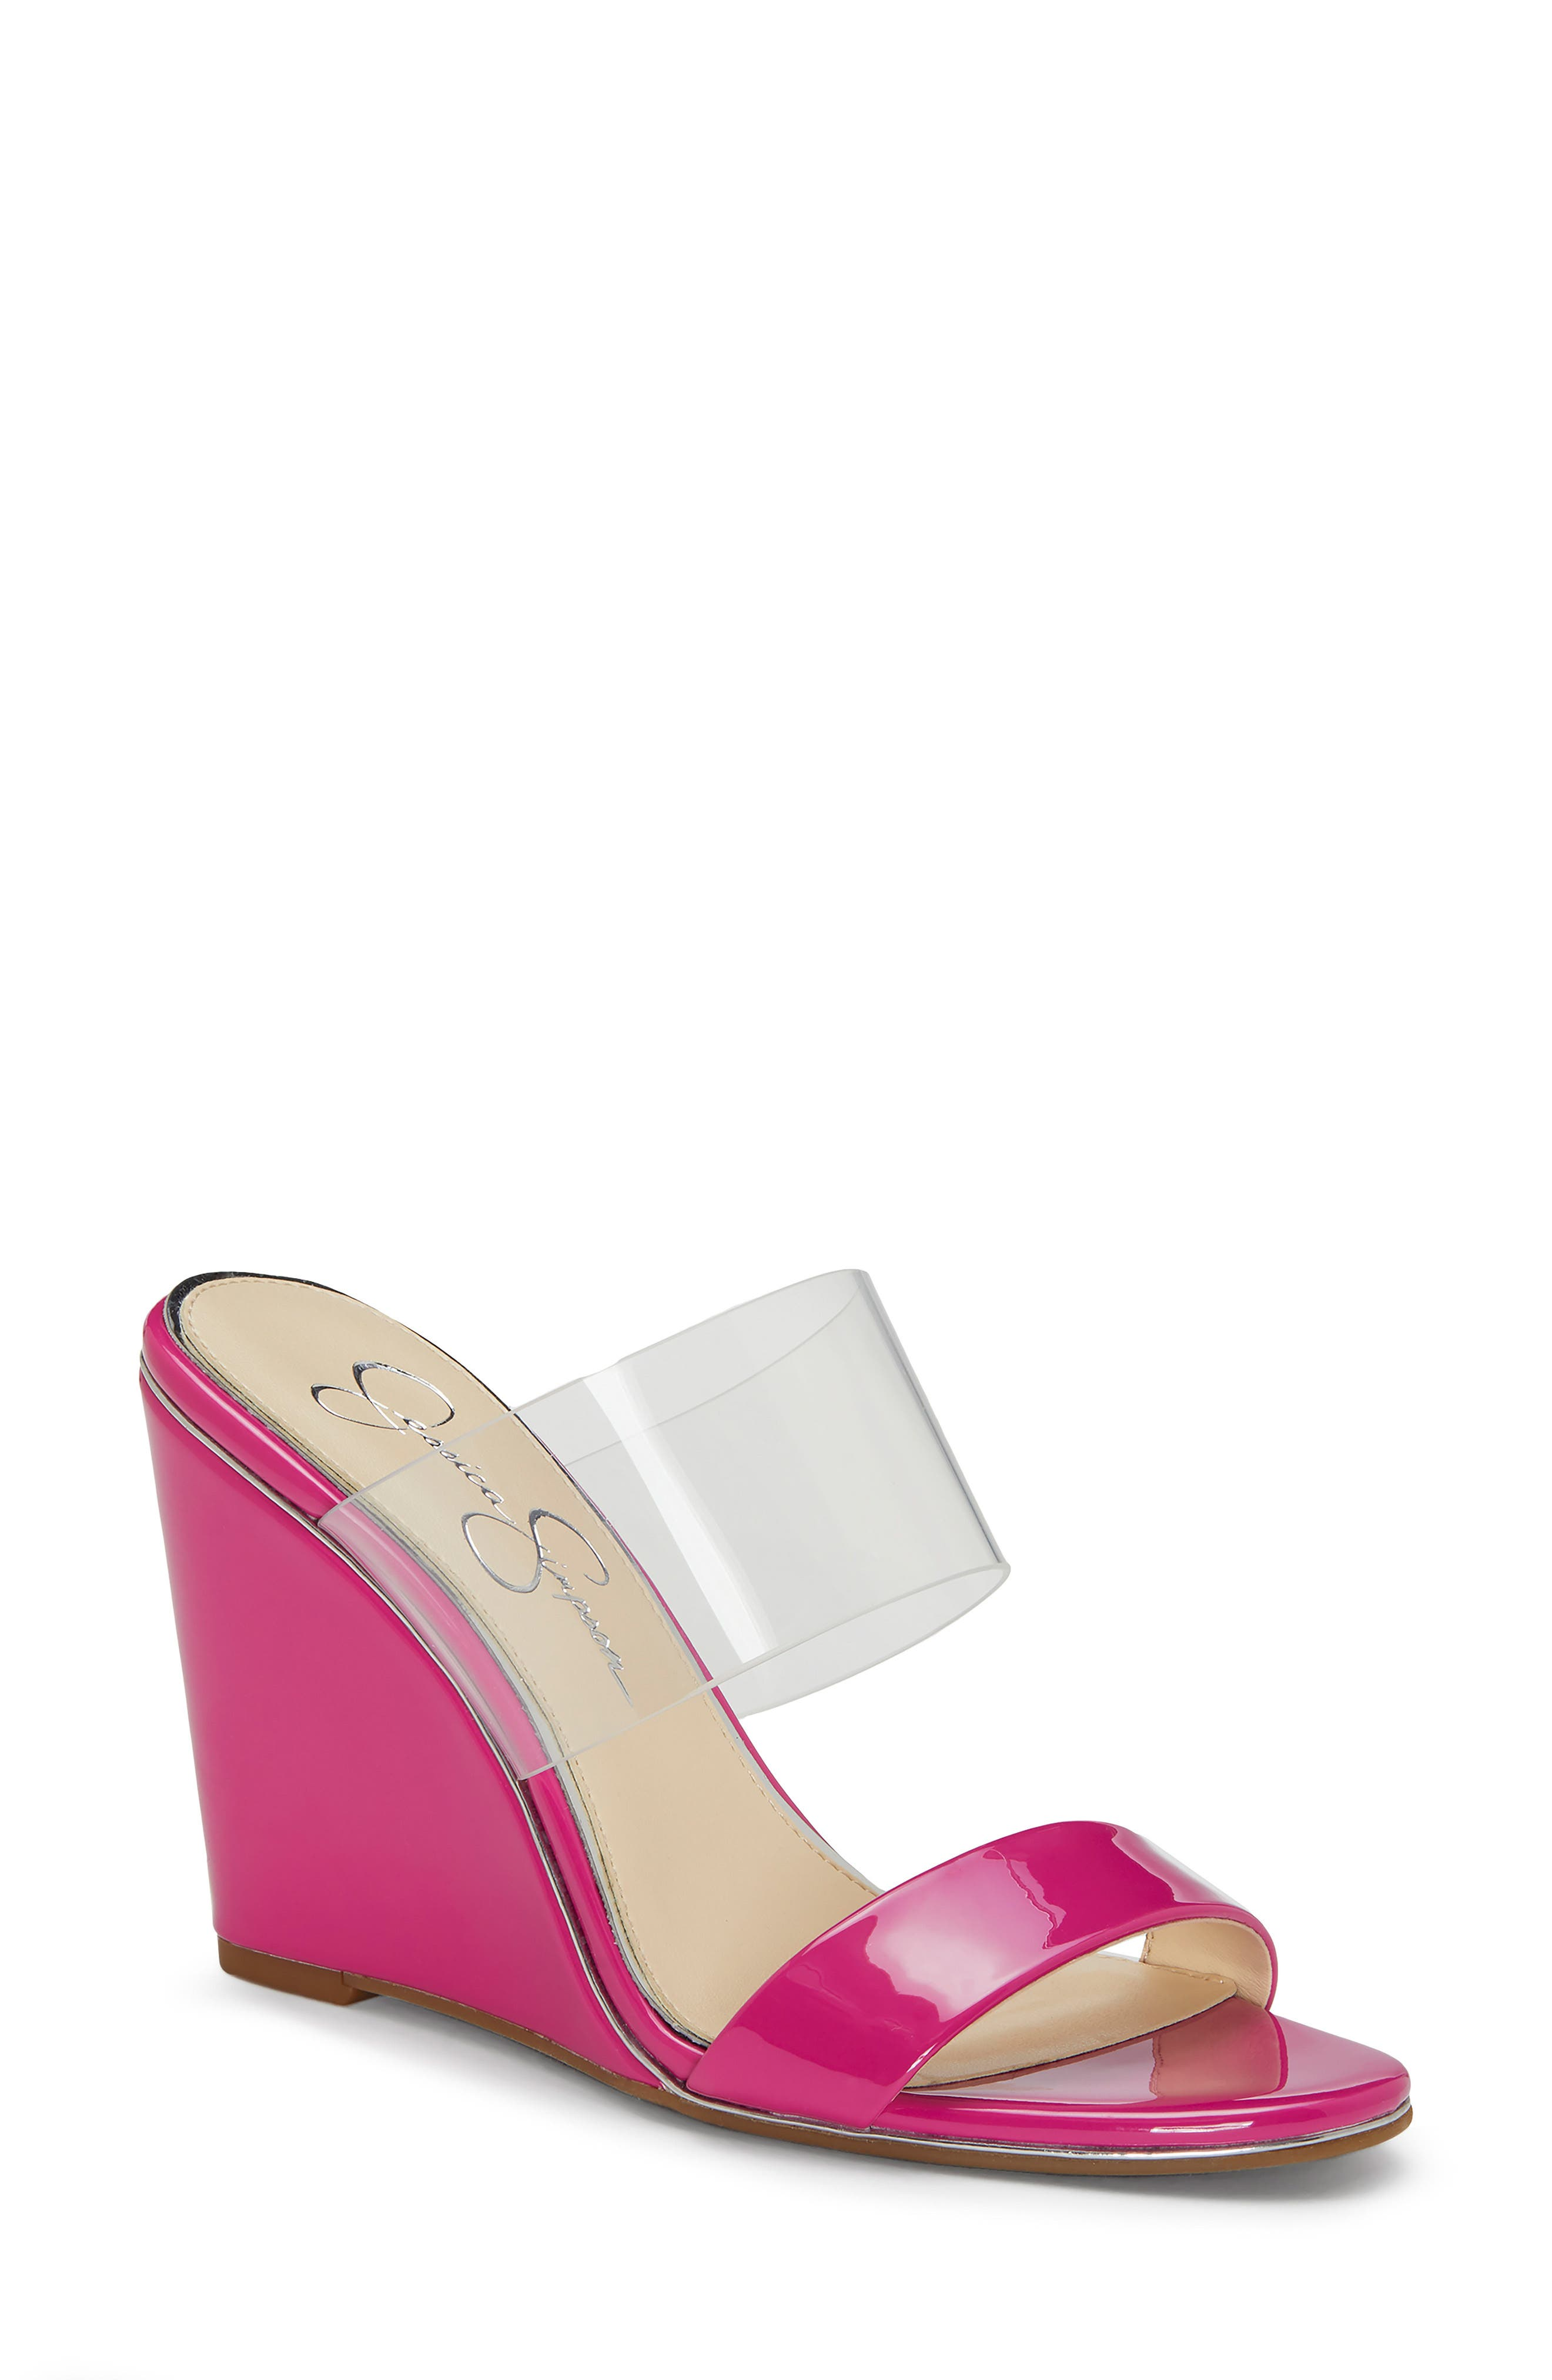 2e82b77ebc03 Women s Jessica Simpson Wedge Sandals